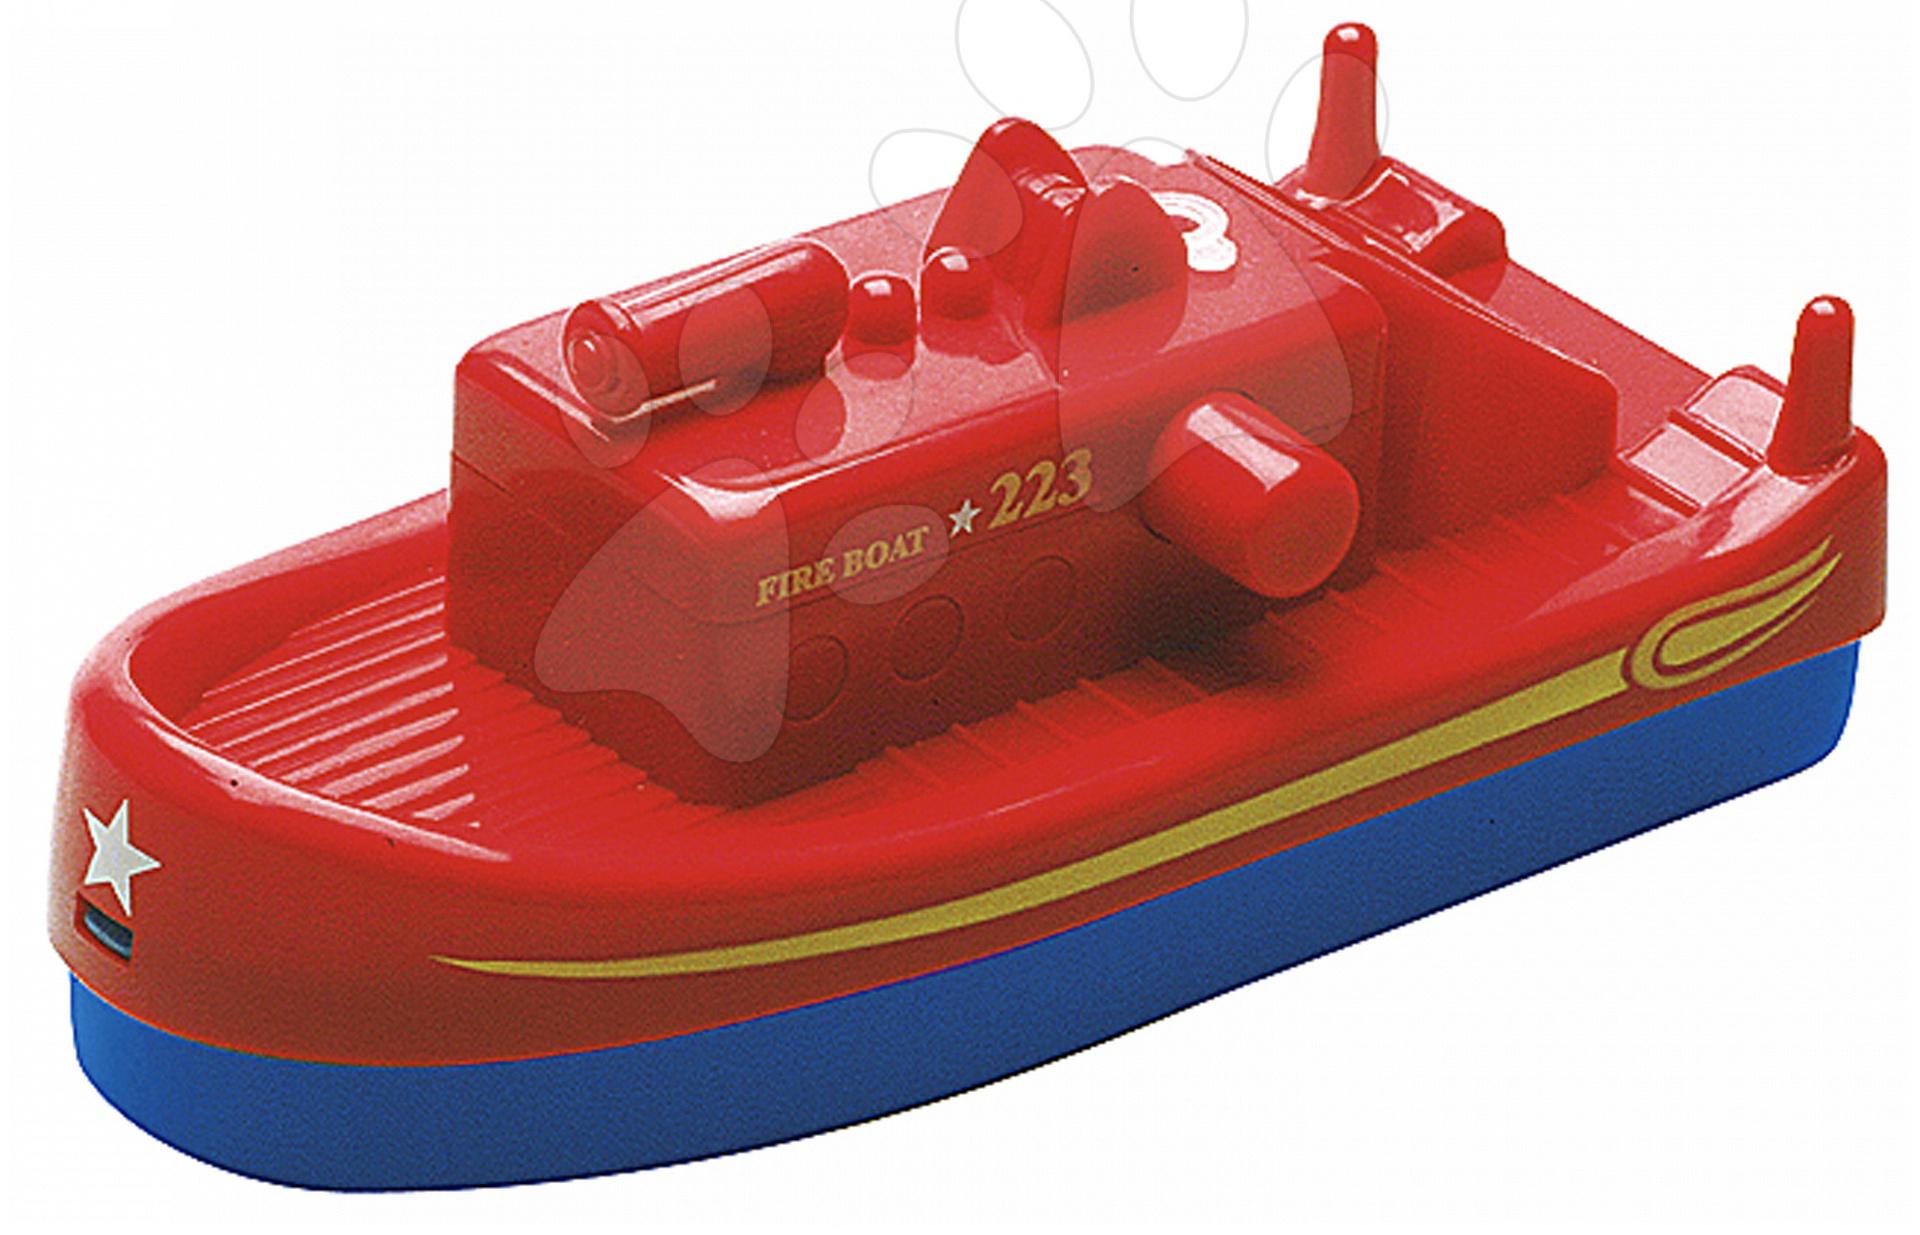 Loď Aquaplay Fireboat s vodným delom s 10 metrovým dostrelom